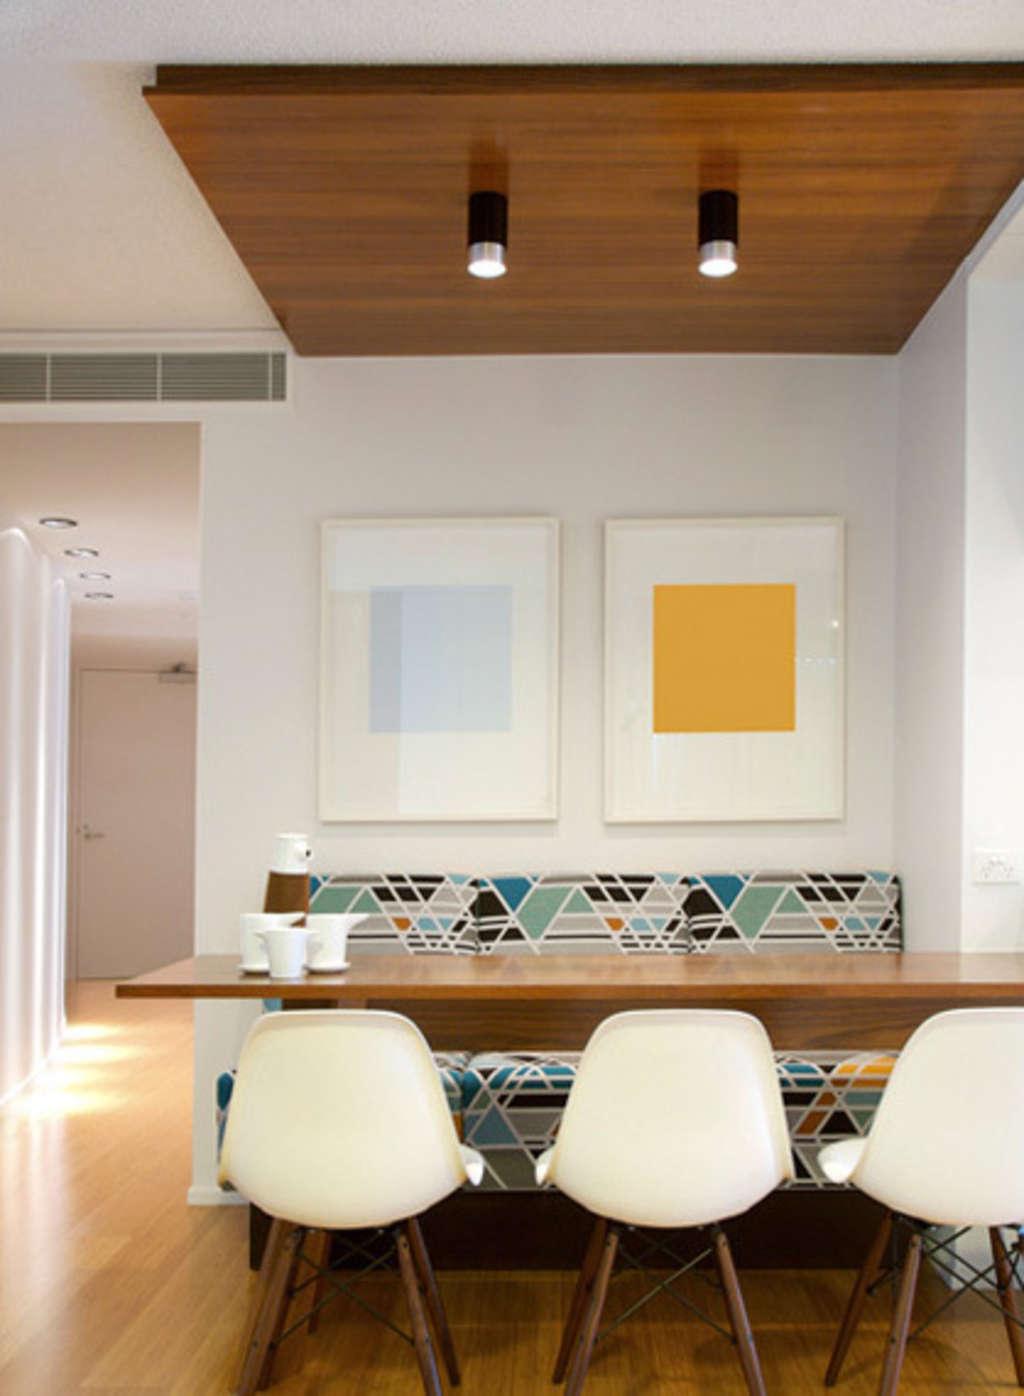 Wrightson stewart modern australian kitchens dining - Bancos para comedor ...